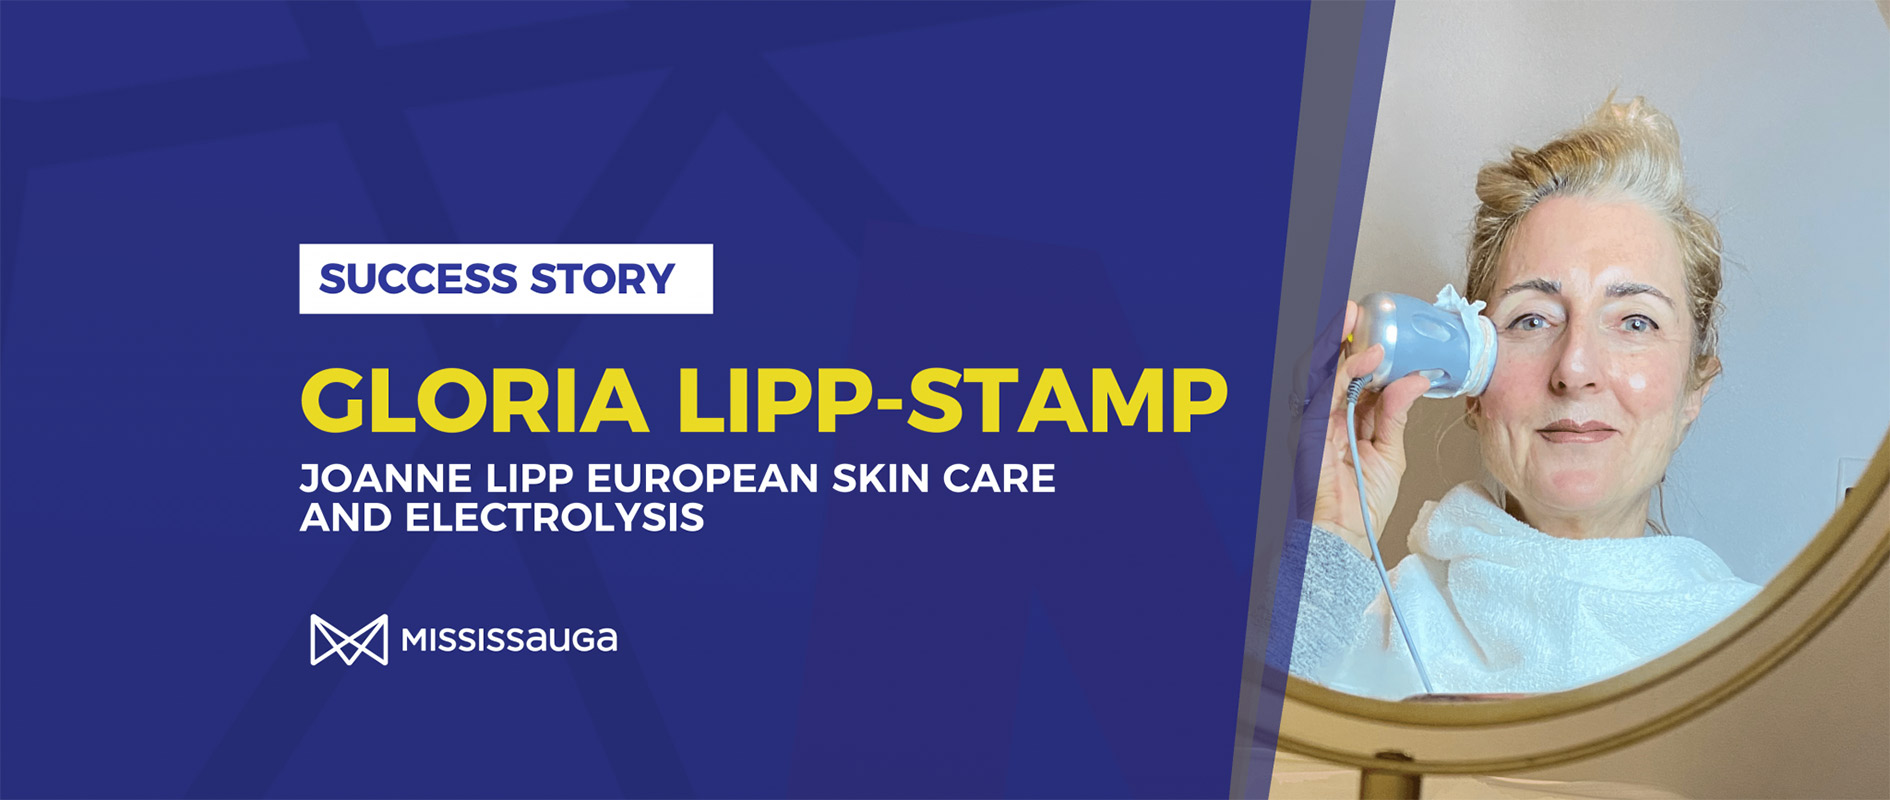 Covid Creates an Accidental Lobbyist – Gloria Lipp-Stamp of Joanne Lipp European Skin Care and Electrolysis